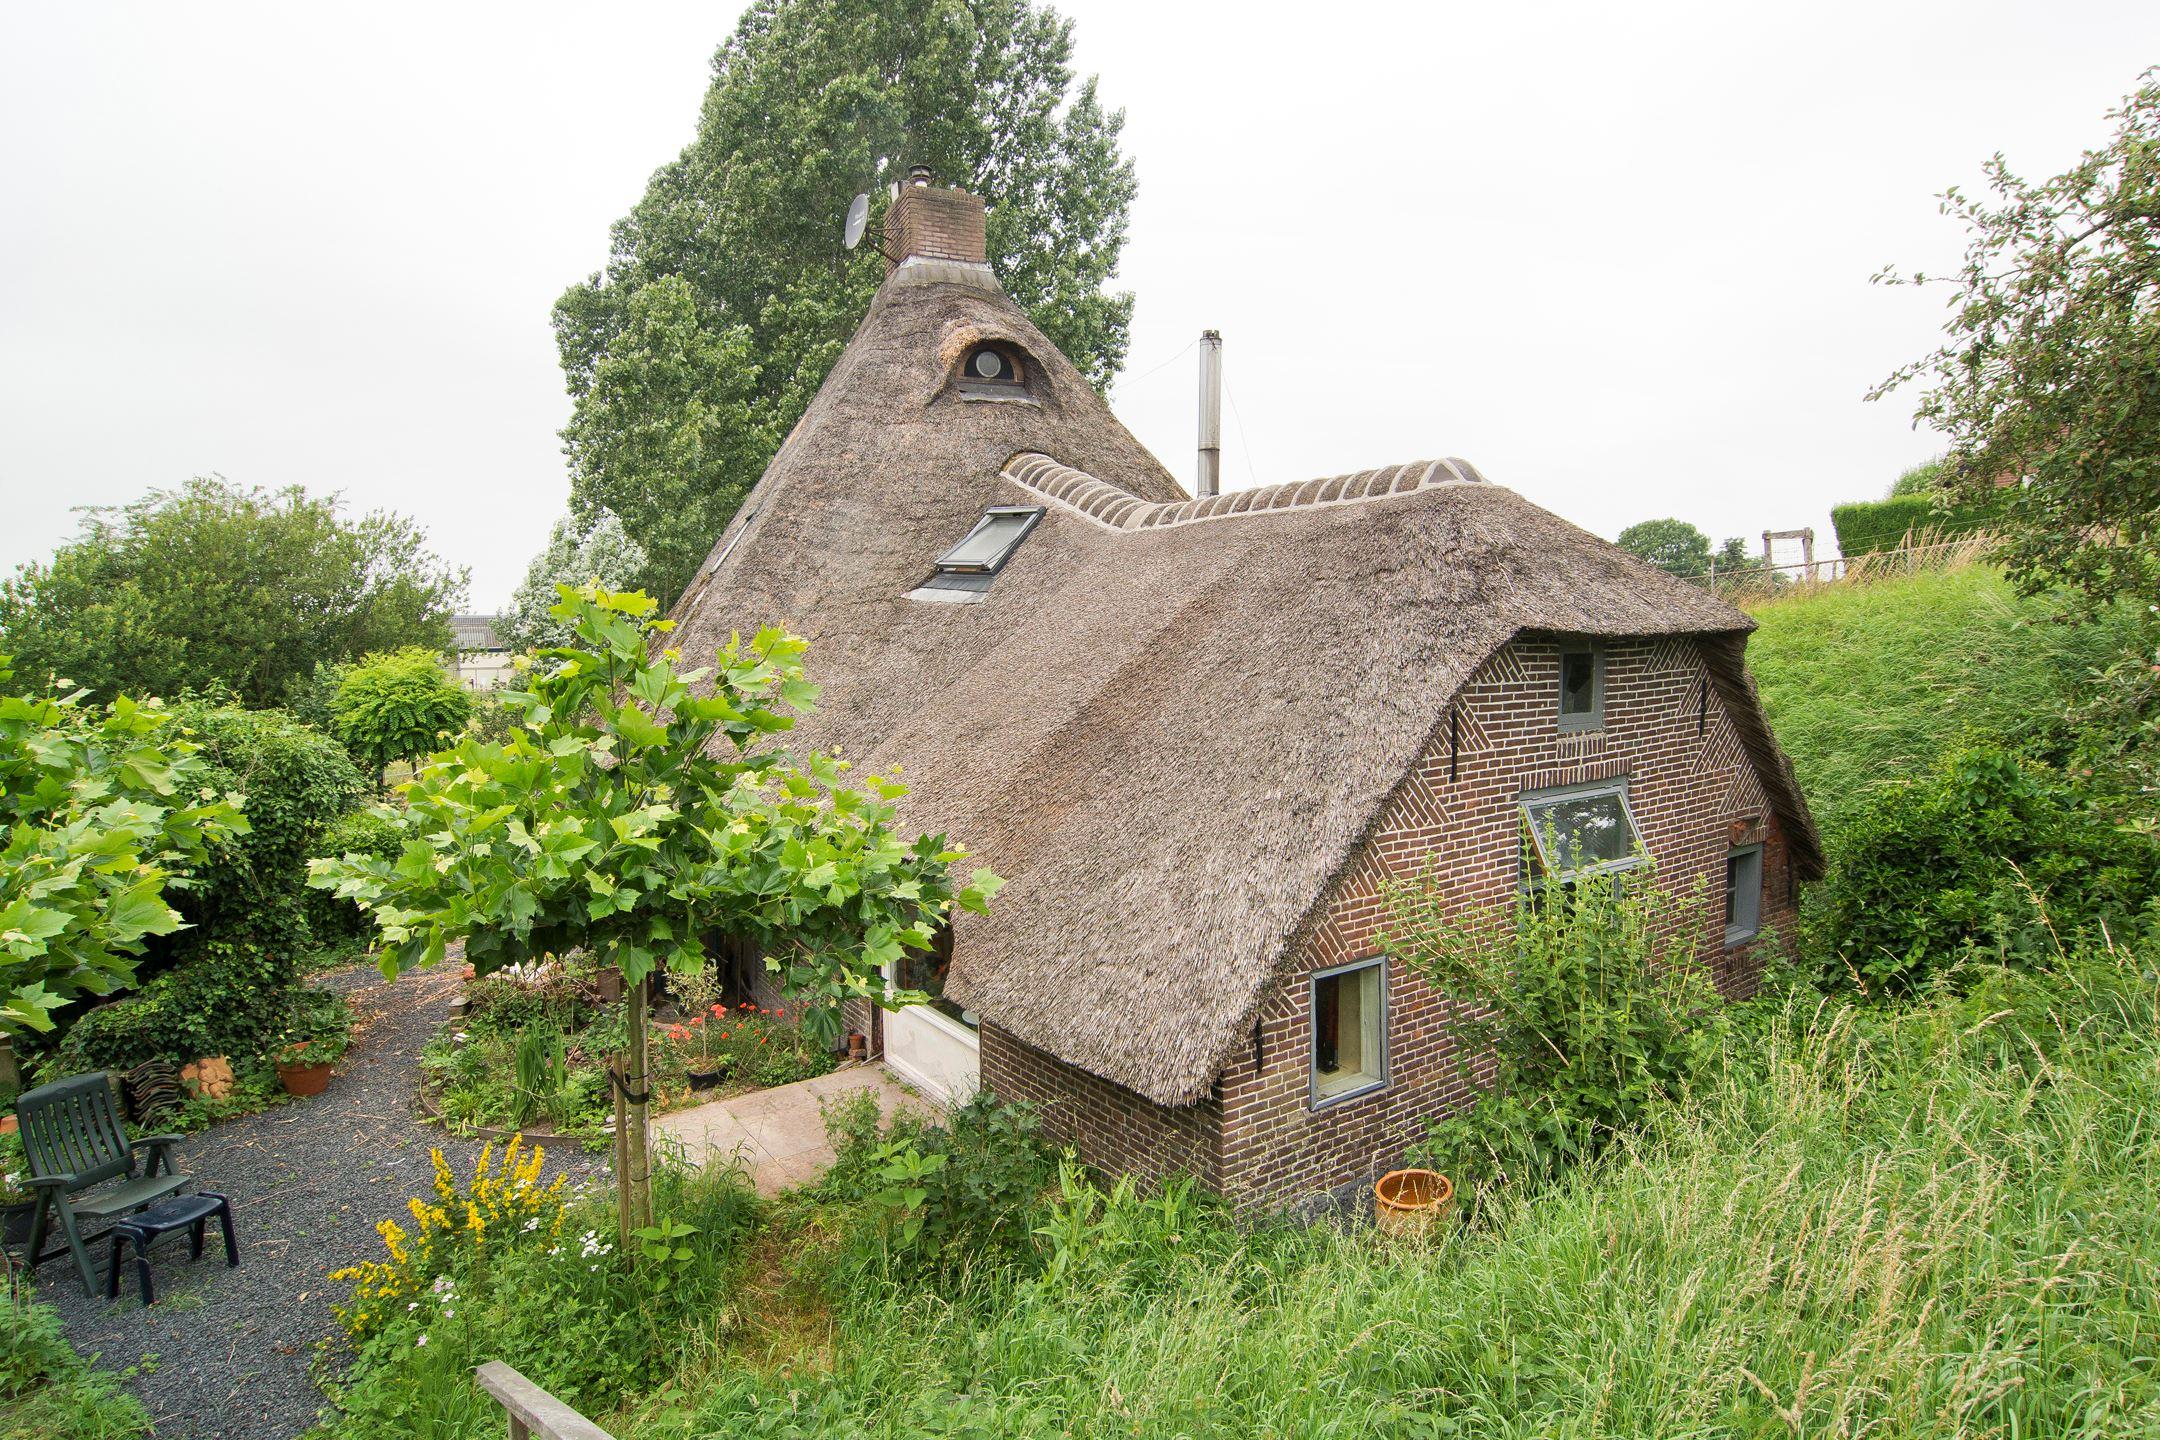 Landelijk Wonen Funda : Verkocht: lekdijk 92 4124 ke hagestein [funda]